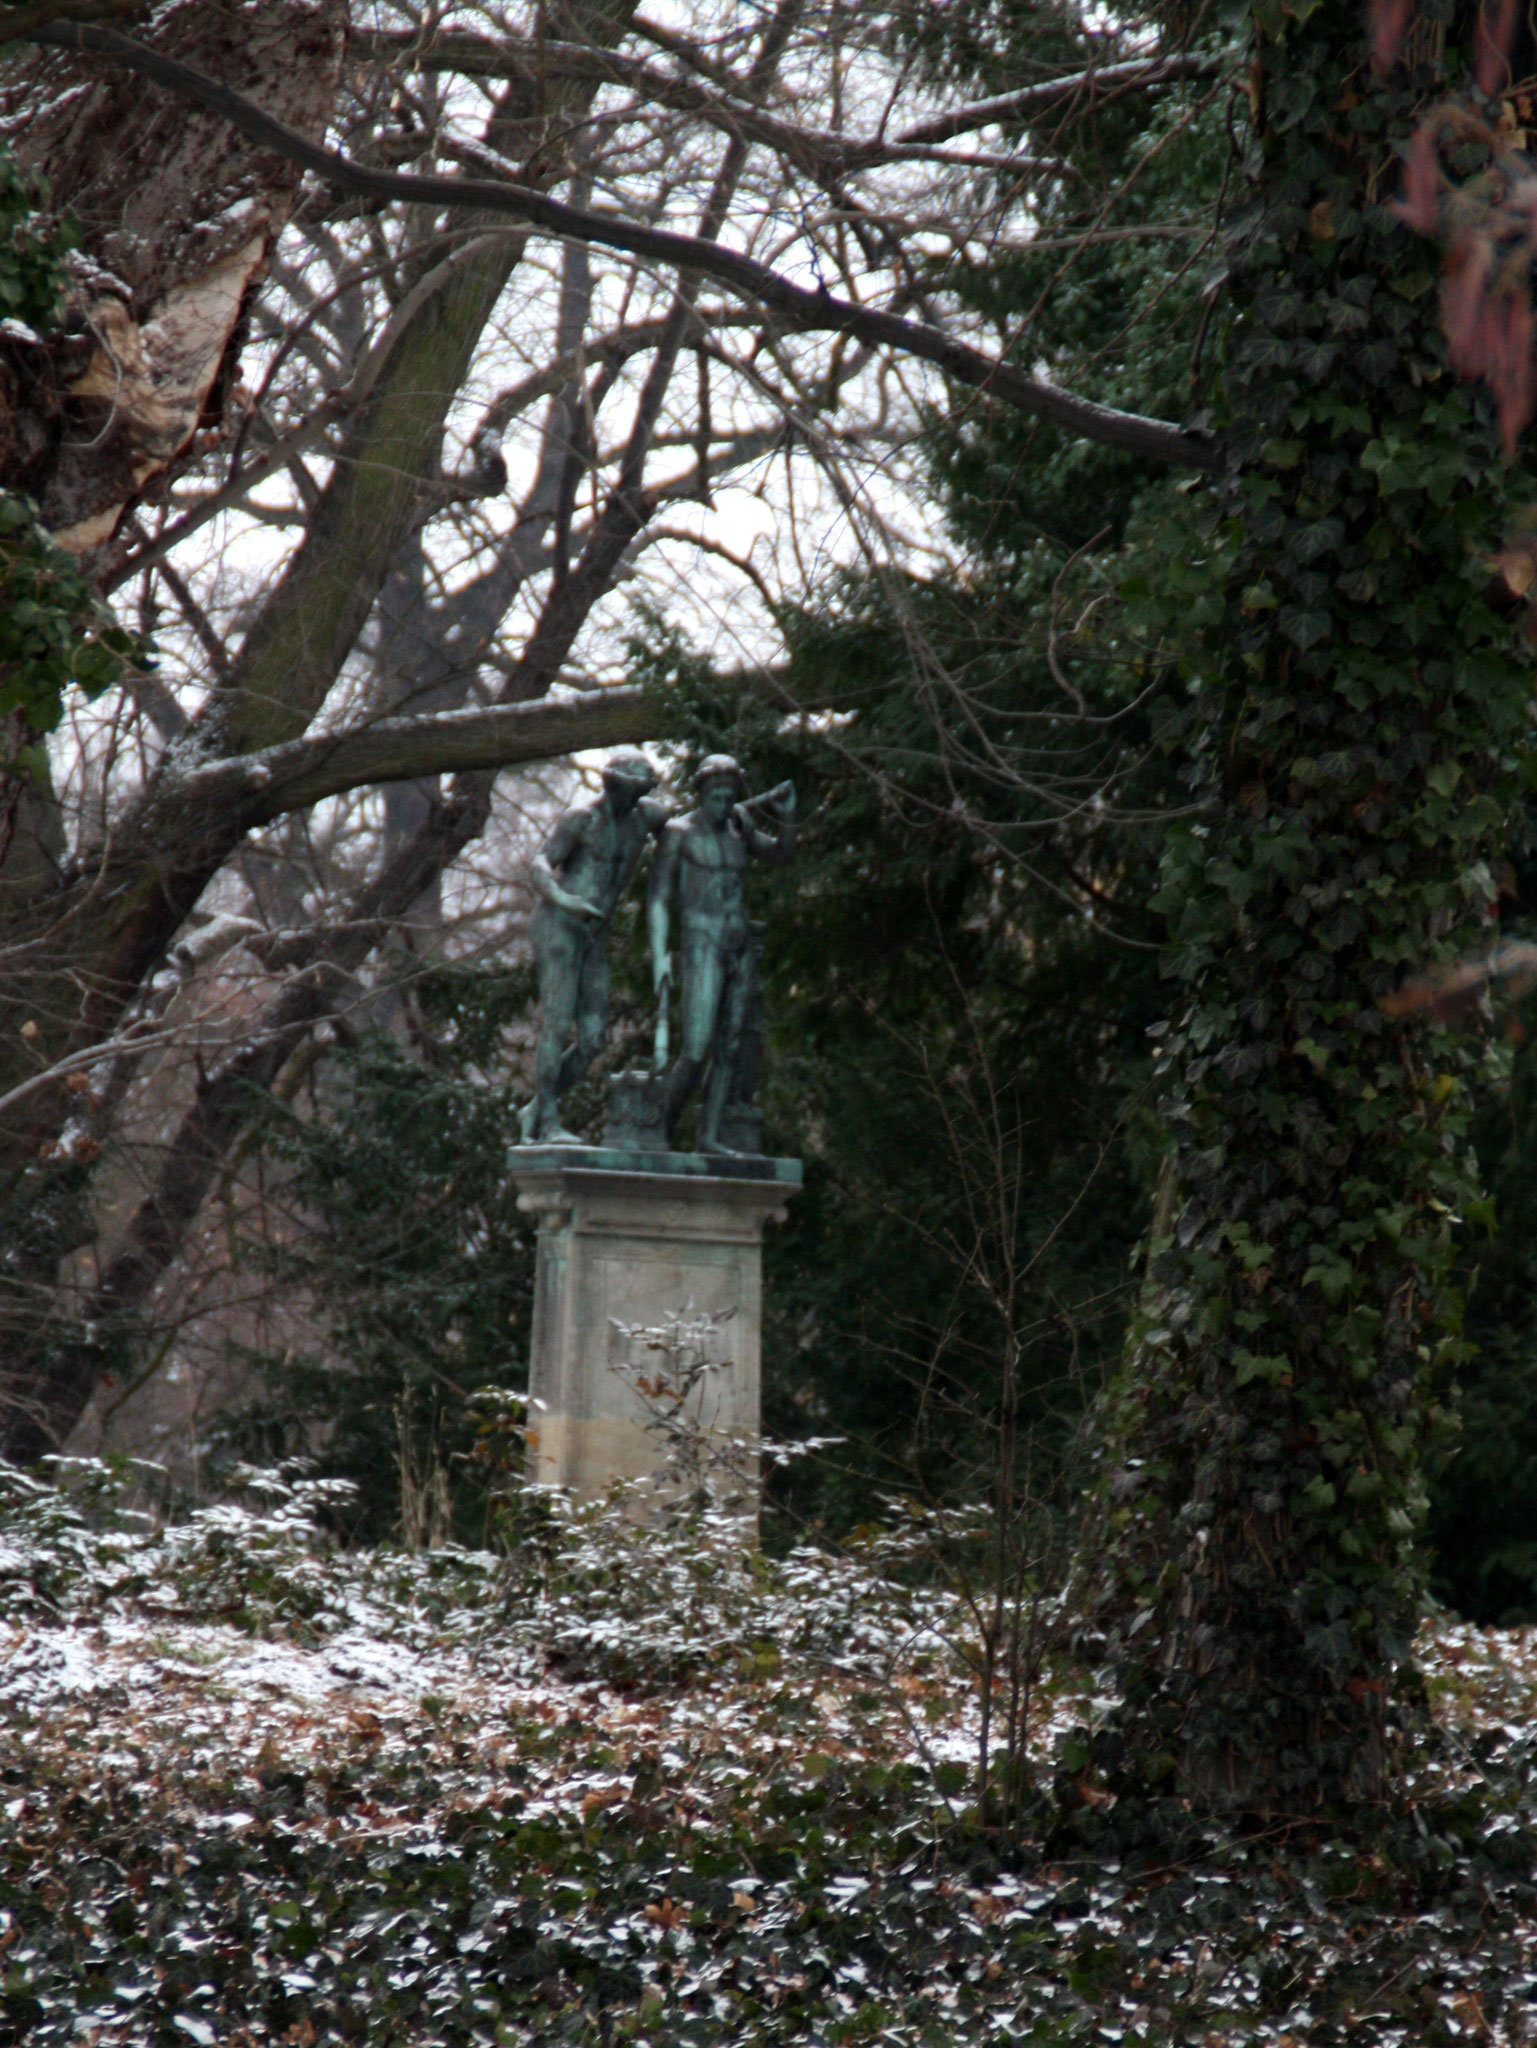 Naturpark mit Kunst. Schlosspark Charlottenburg im Winter. Foto: Helga Karl